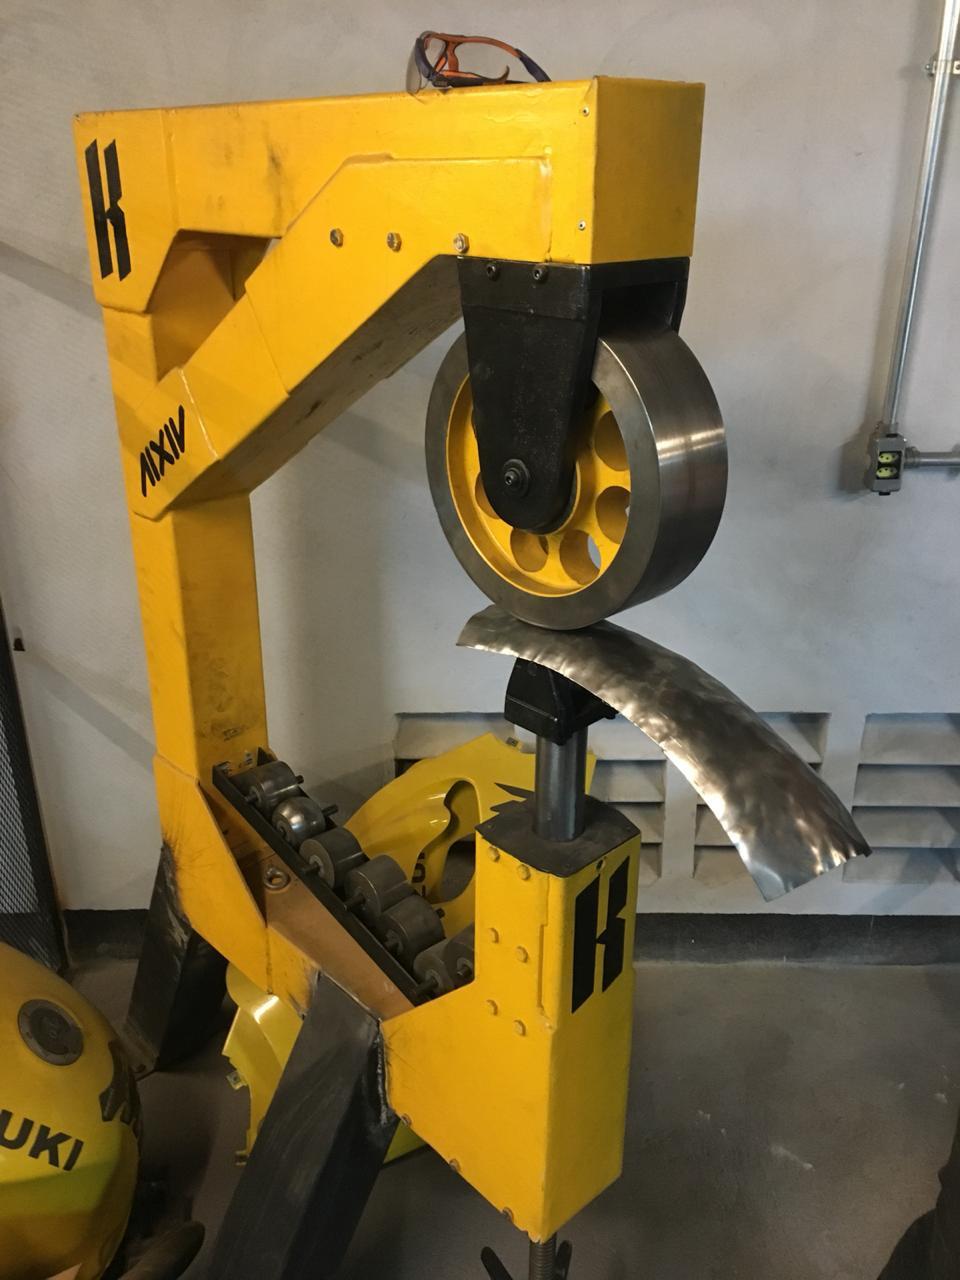 Metal Shaping - Como modelar chapas